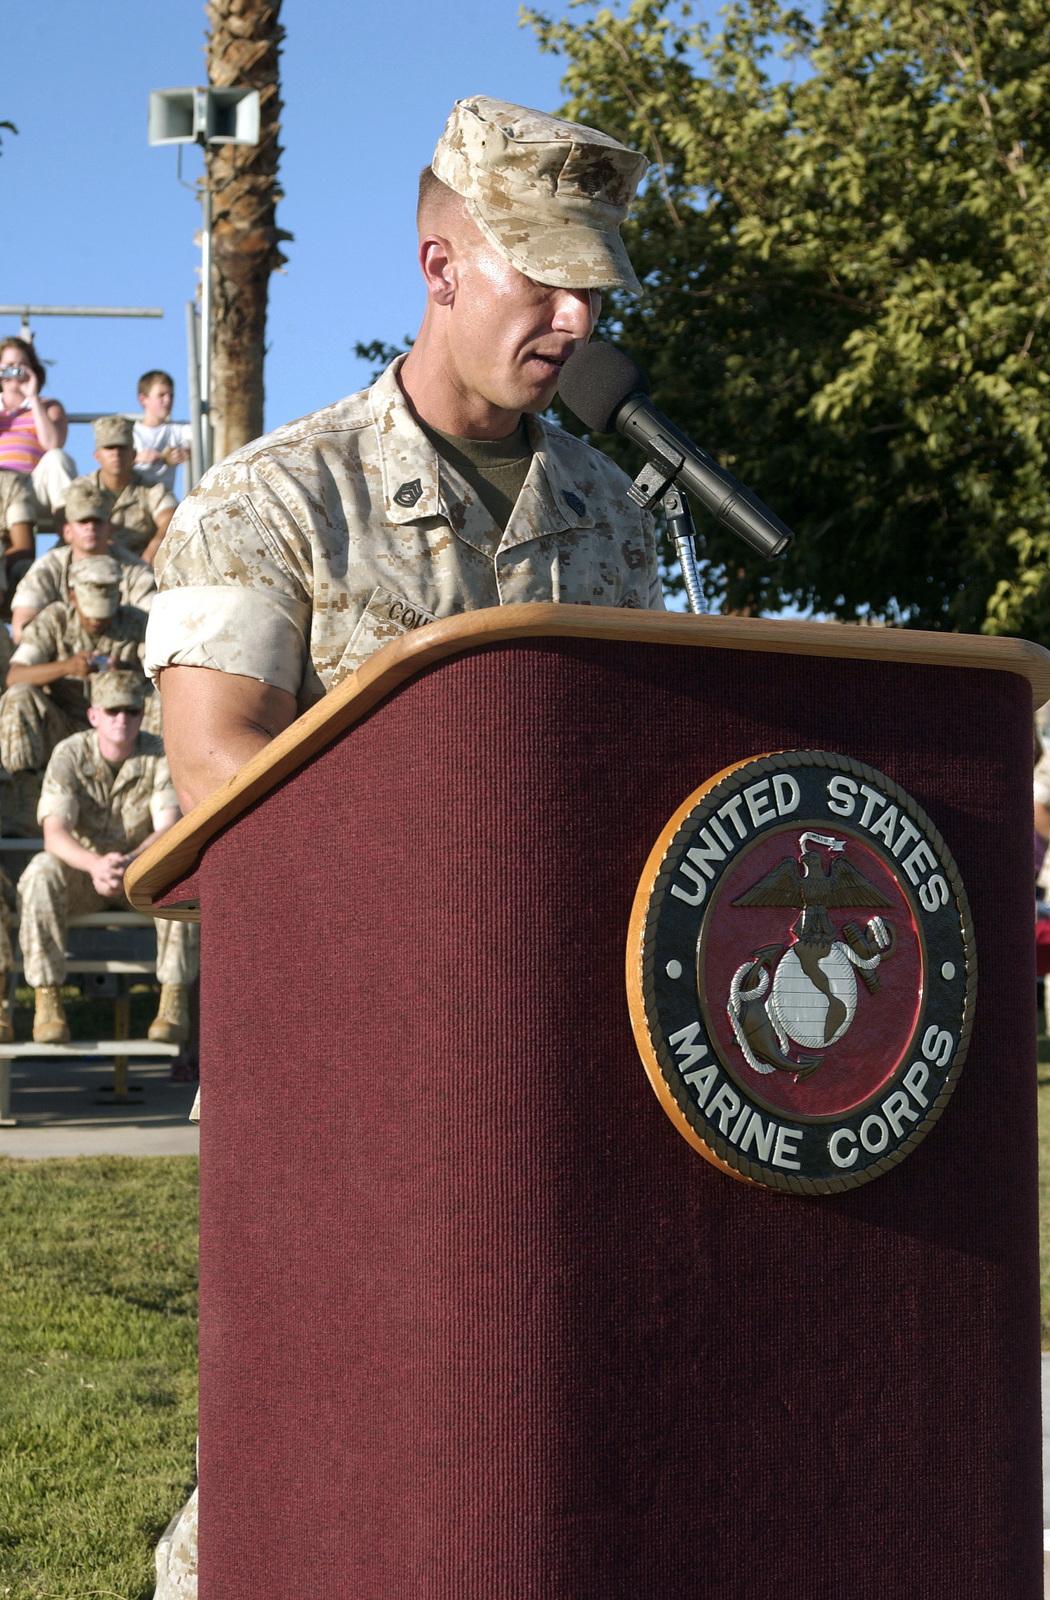 us marine corps usmc gunnery sergeant gysgt courvilie gives the